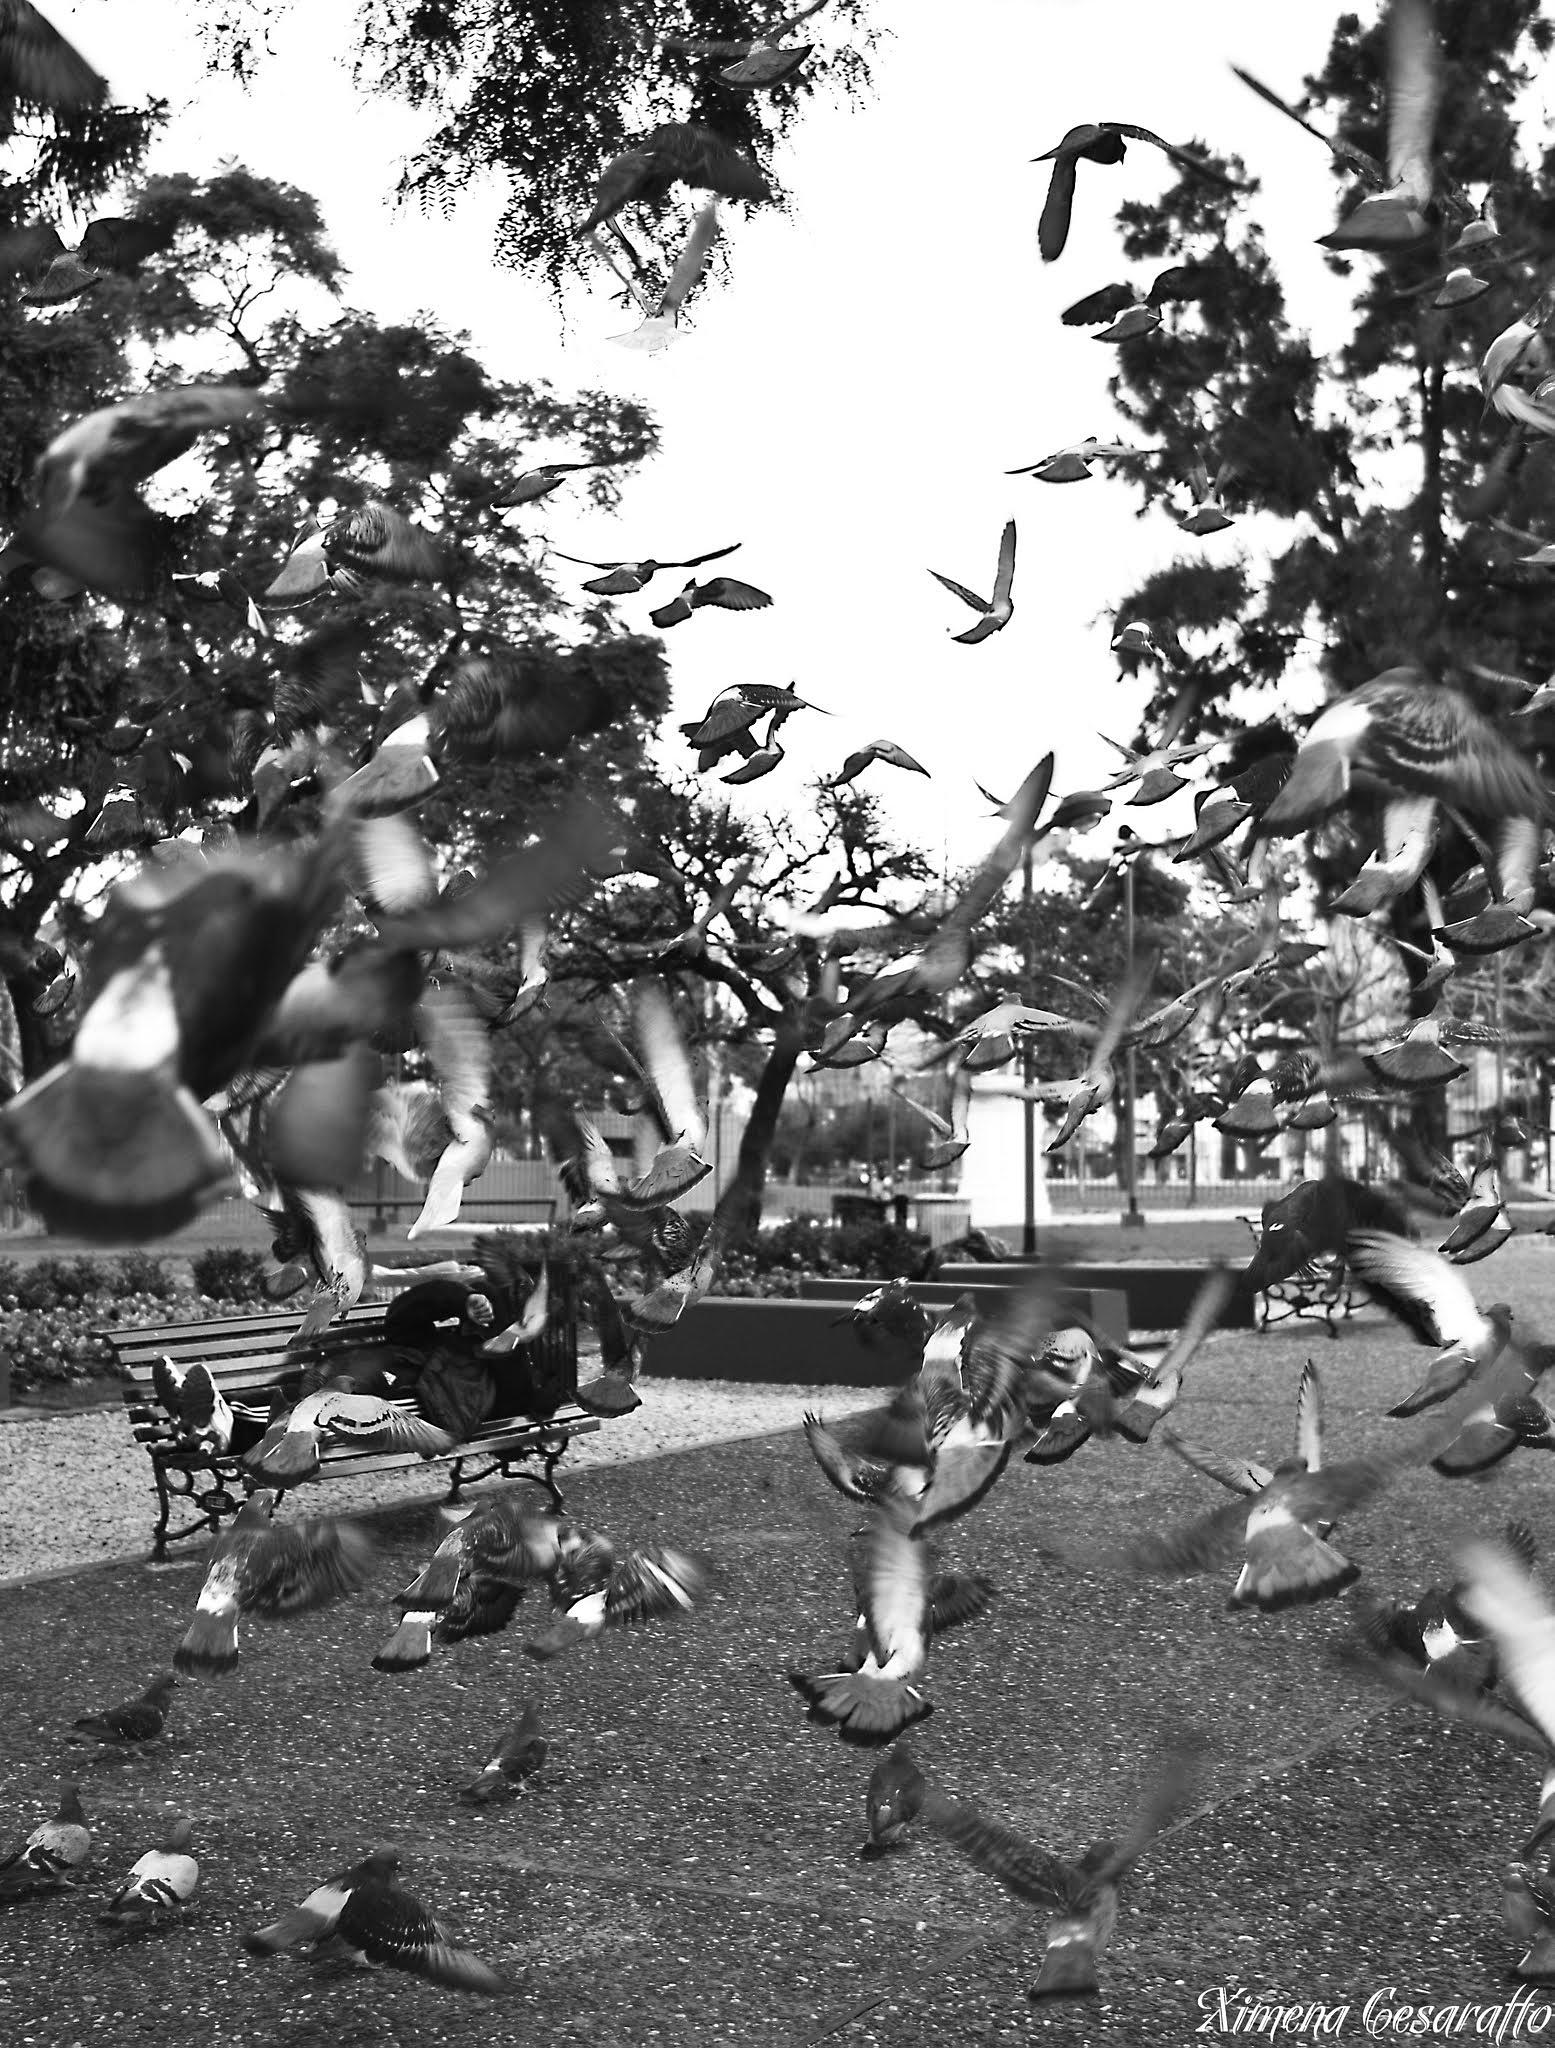 Birds by Xime Cesaratto Errea